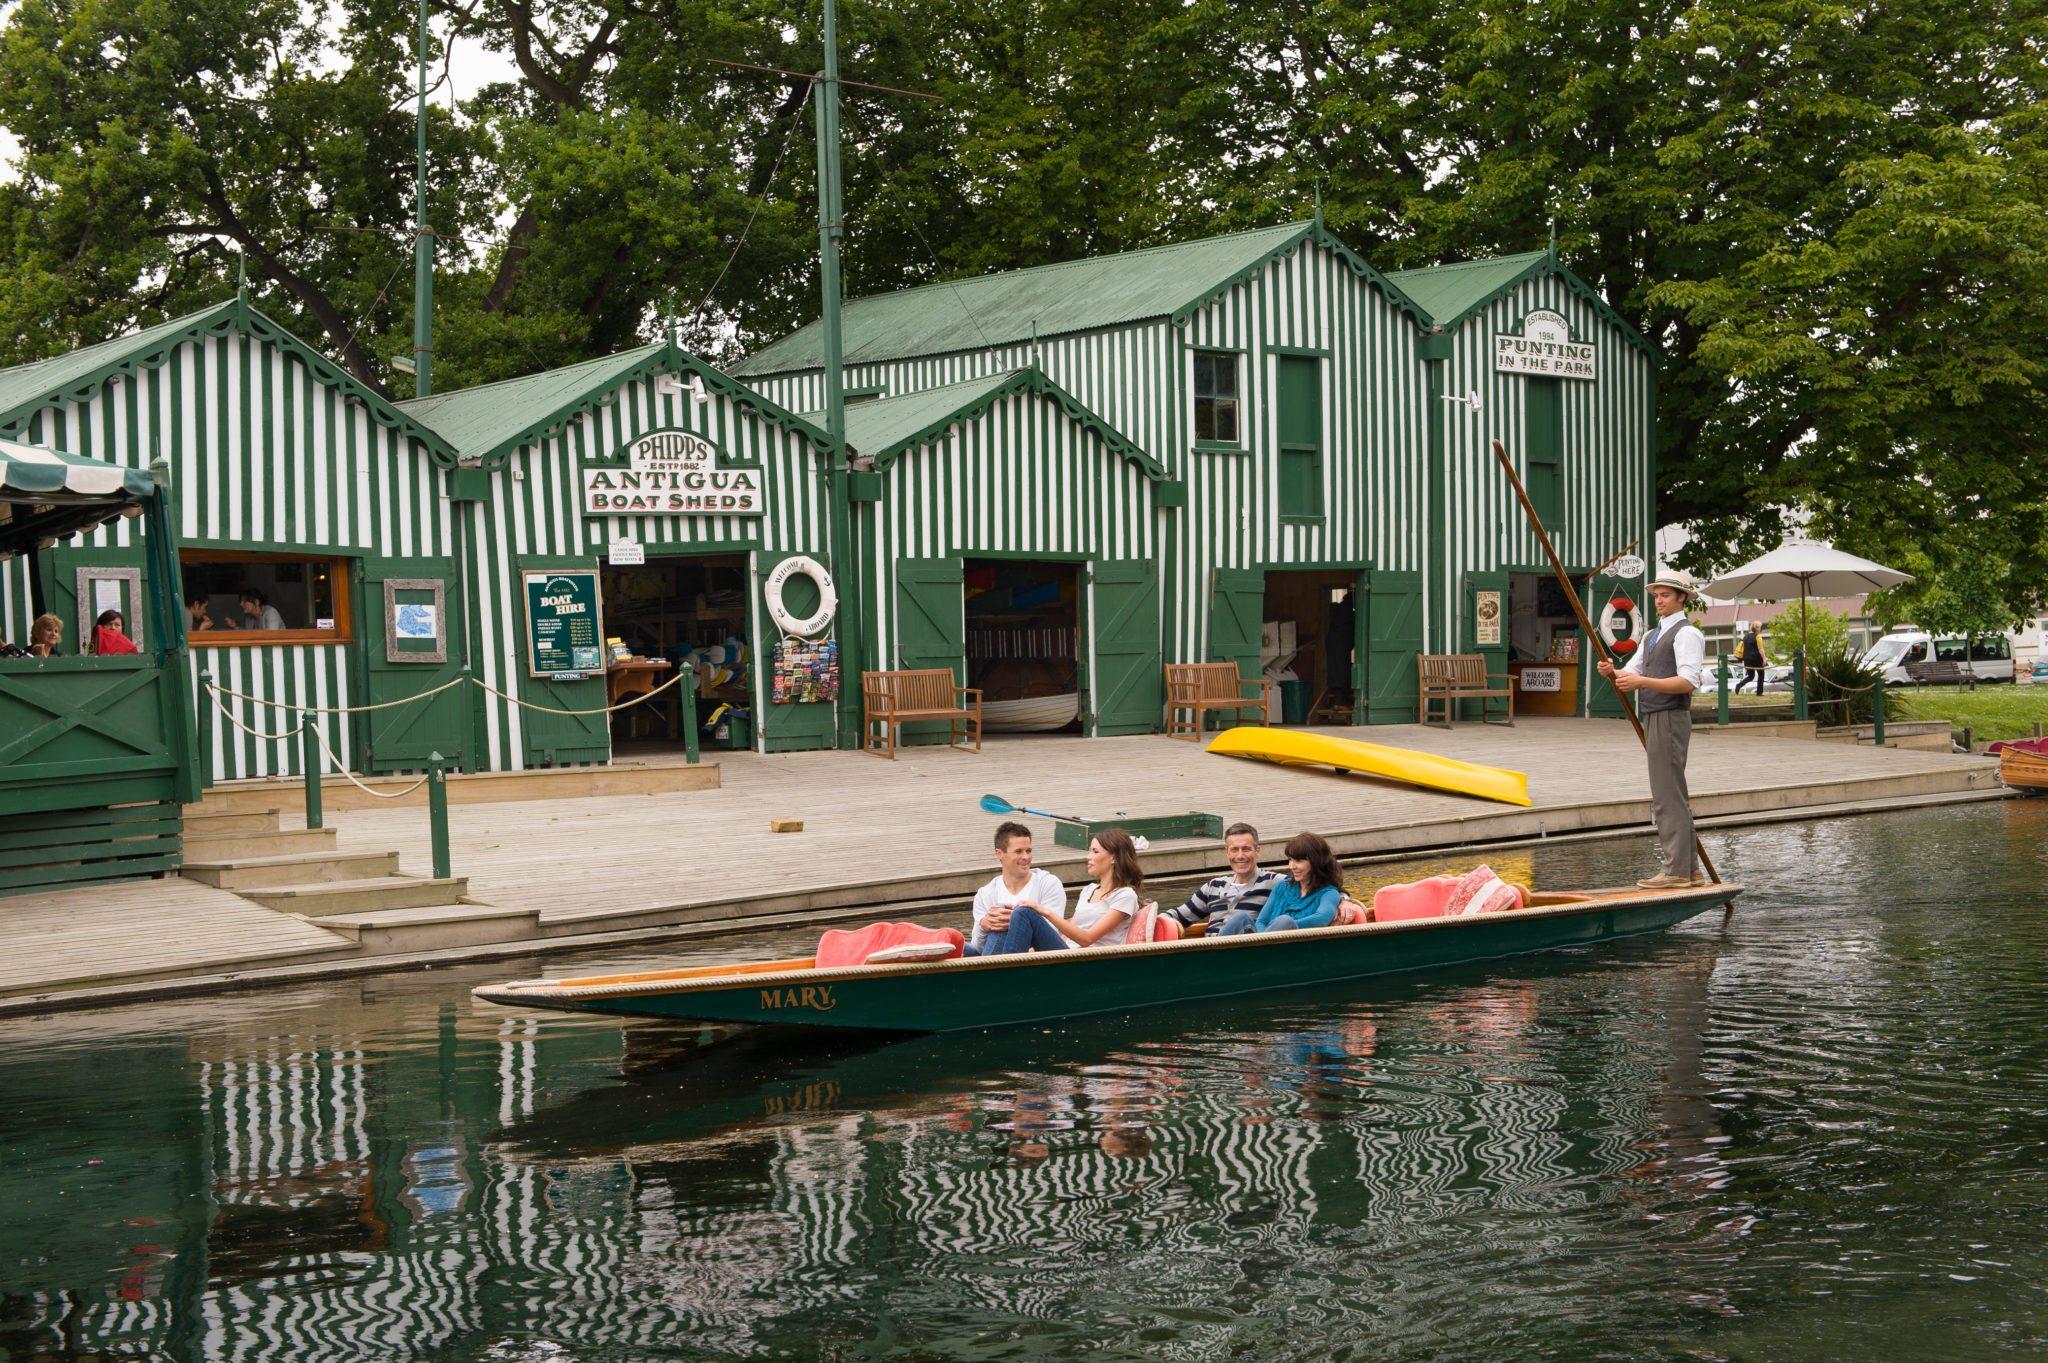 friends_enjoying_a_spring_punt_outside_antigua_boatsheds